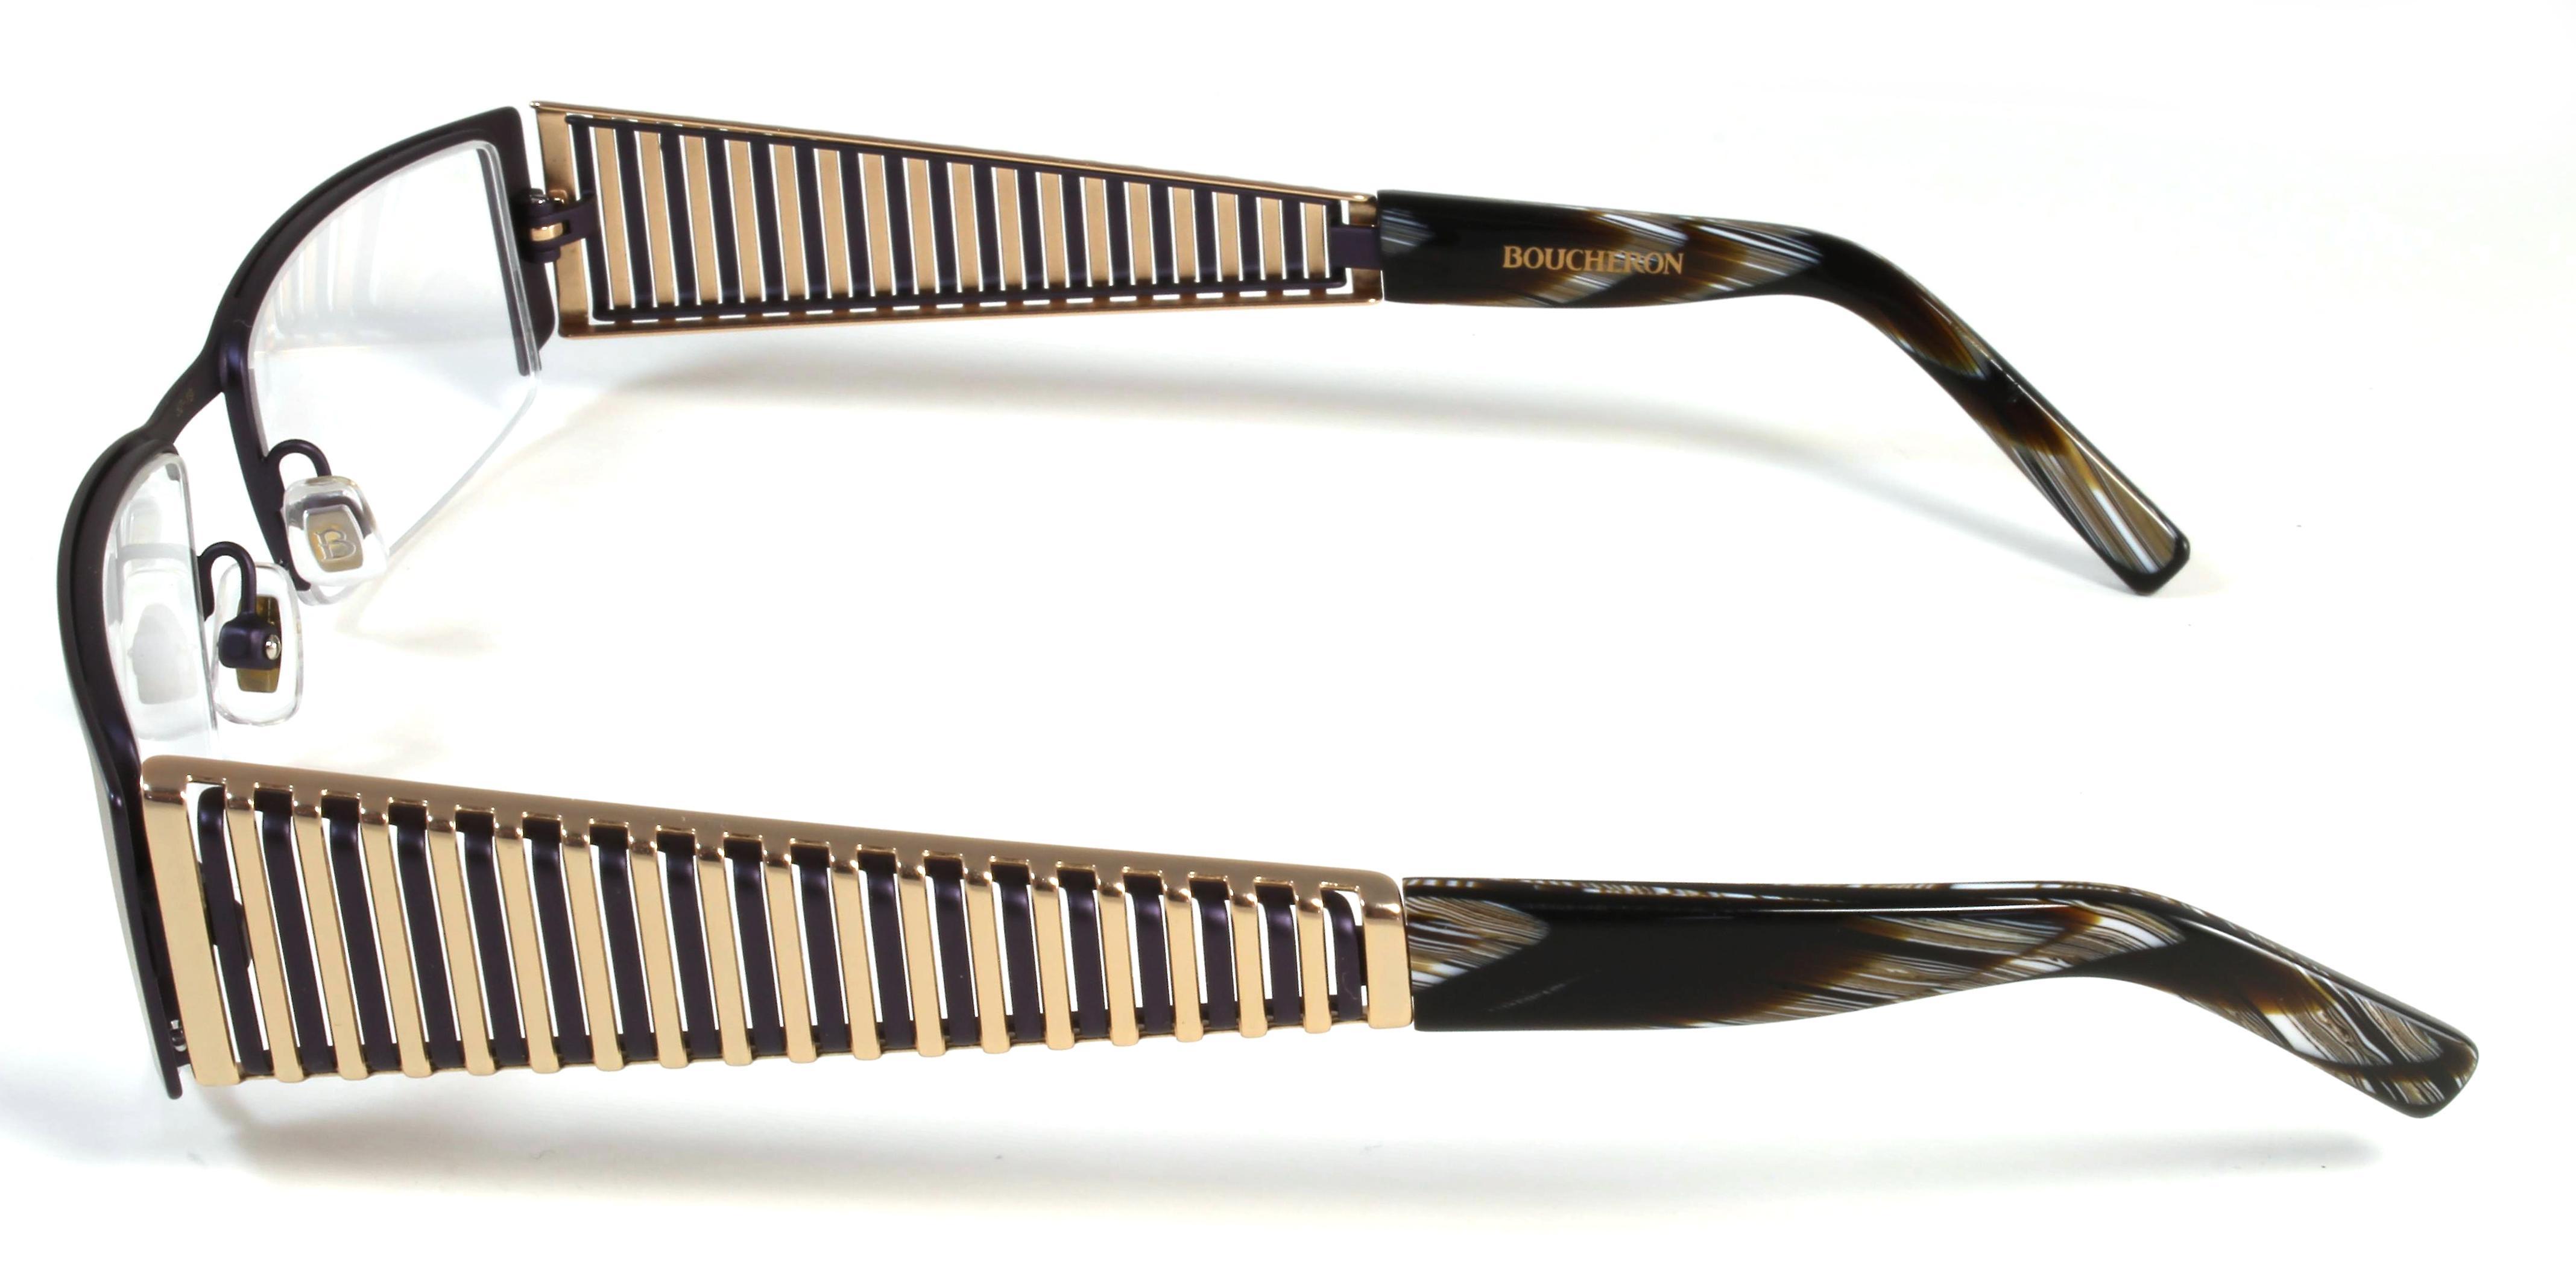 Boucheron Unisex Semi-Rectangle Eyeglasses Purple/Gold